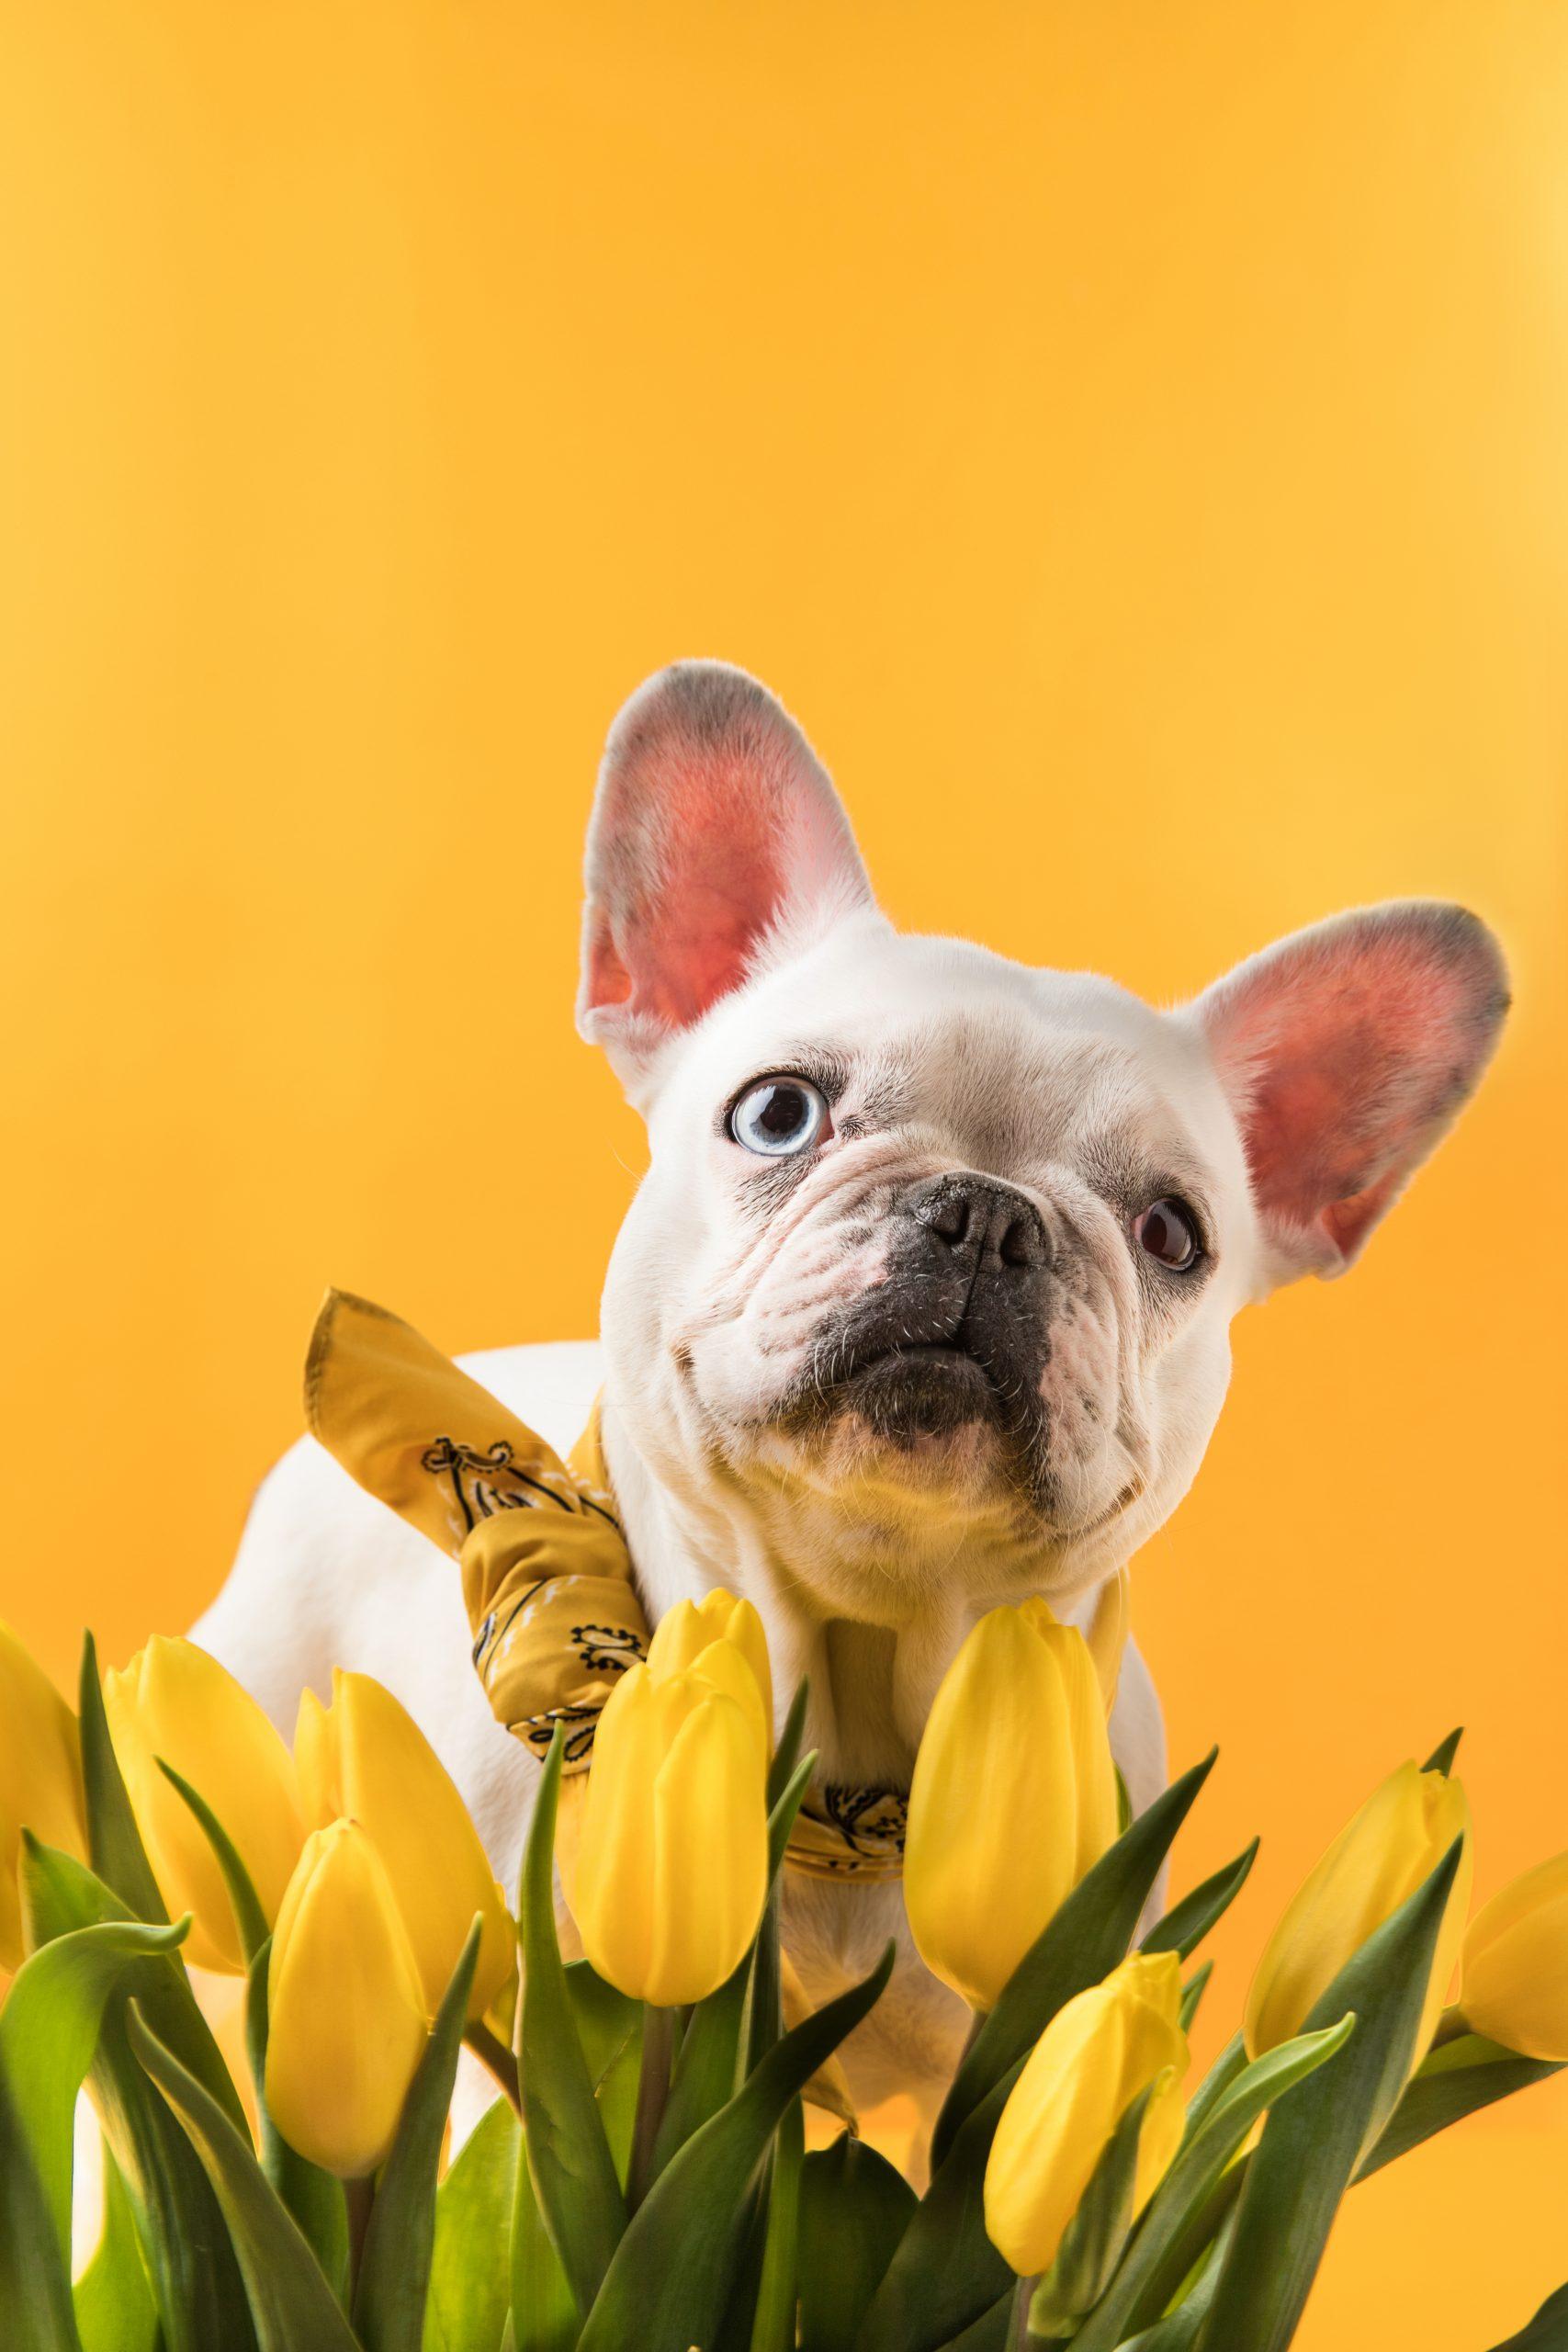 https://depositphotos.com/183110218/stock-photo-french-bulldog-dog-beautiful-yellow.html